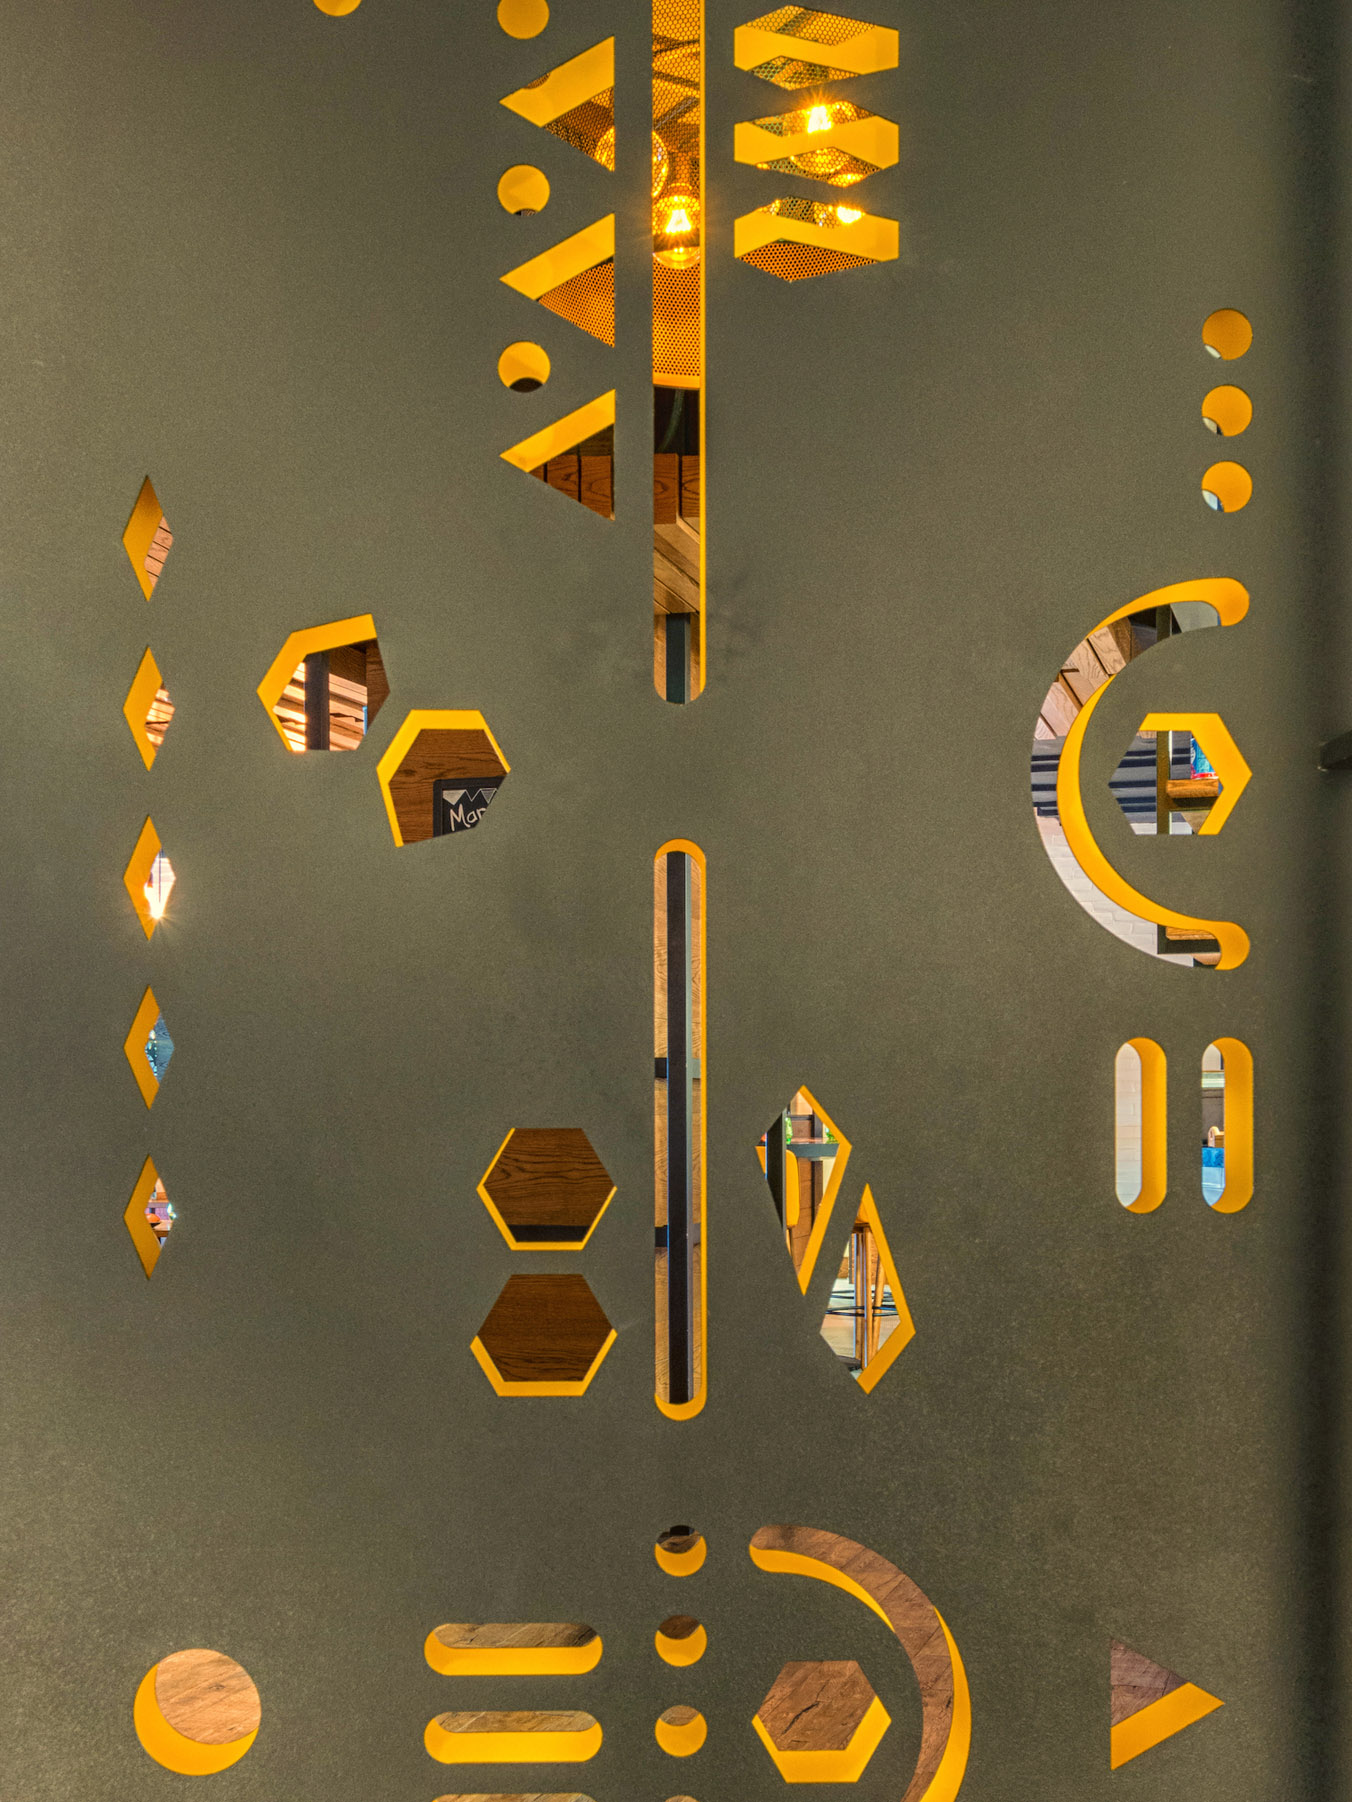 04-capsule-arts-projects-tablita-entrance-02.jpg